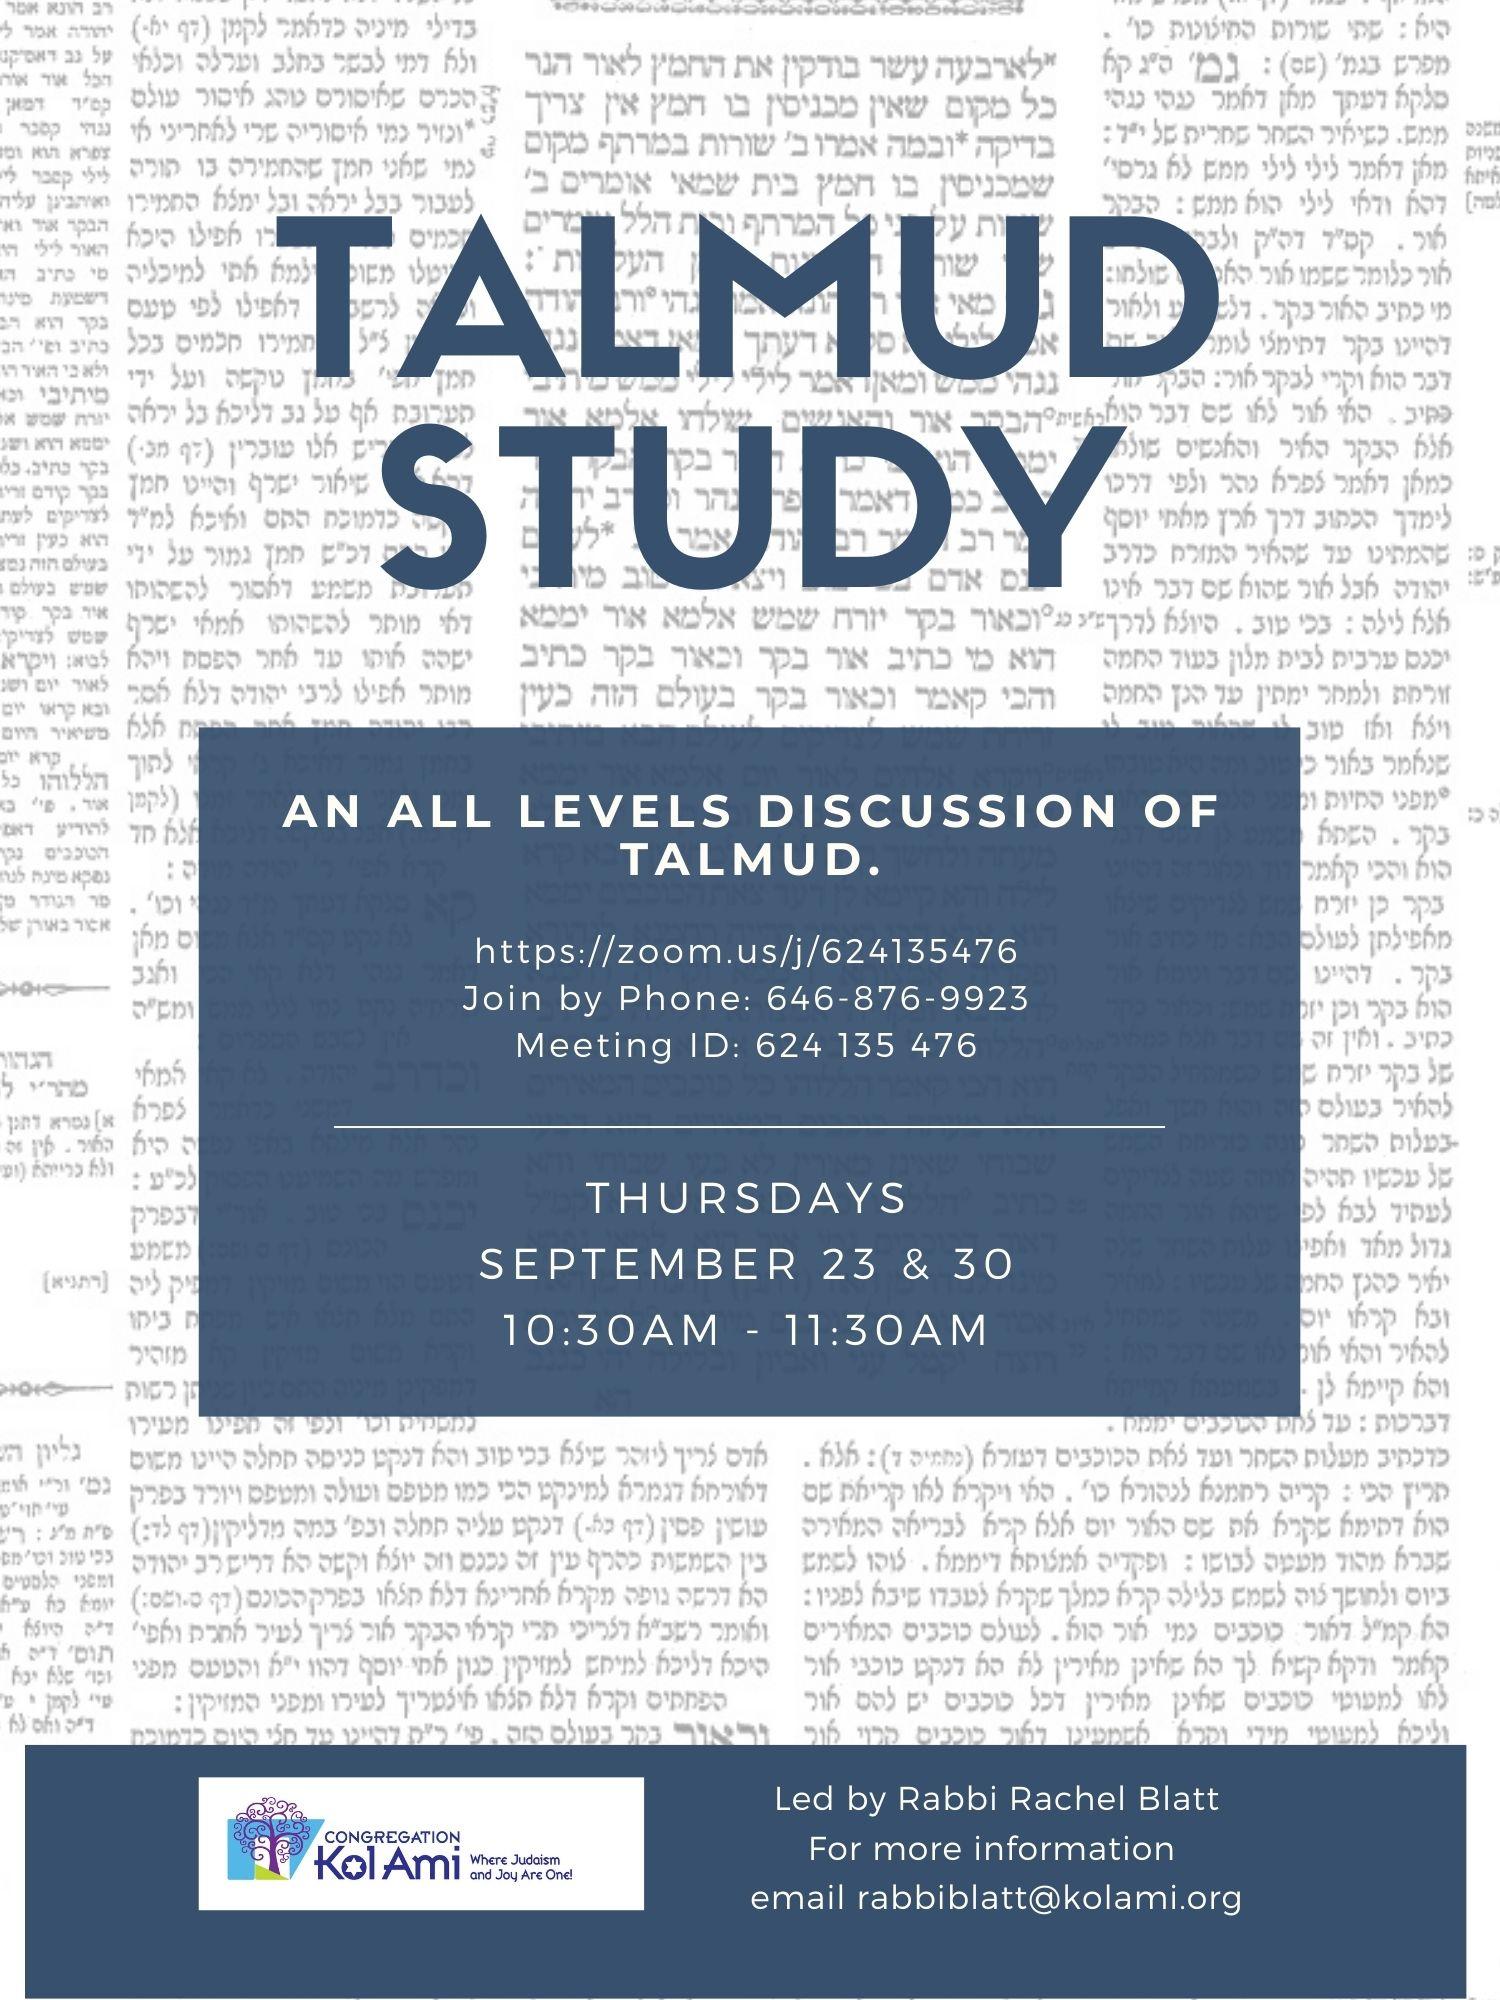 Banner Image for Weekly Talmud Study Class with Rabbi Blatt